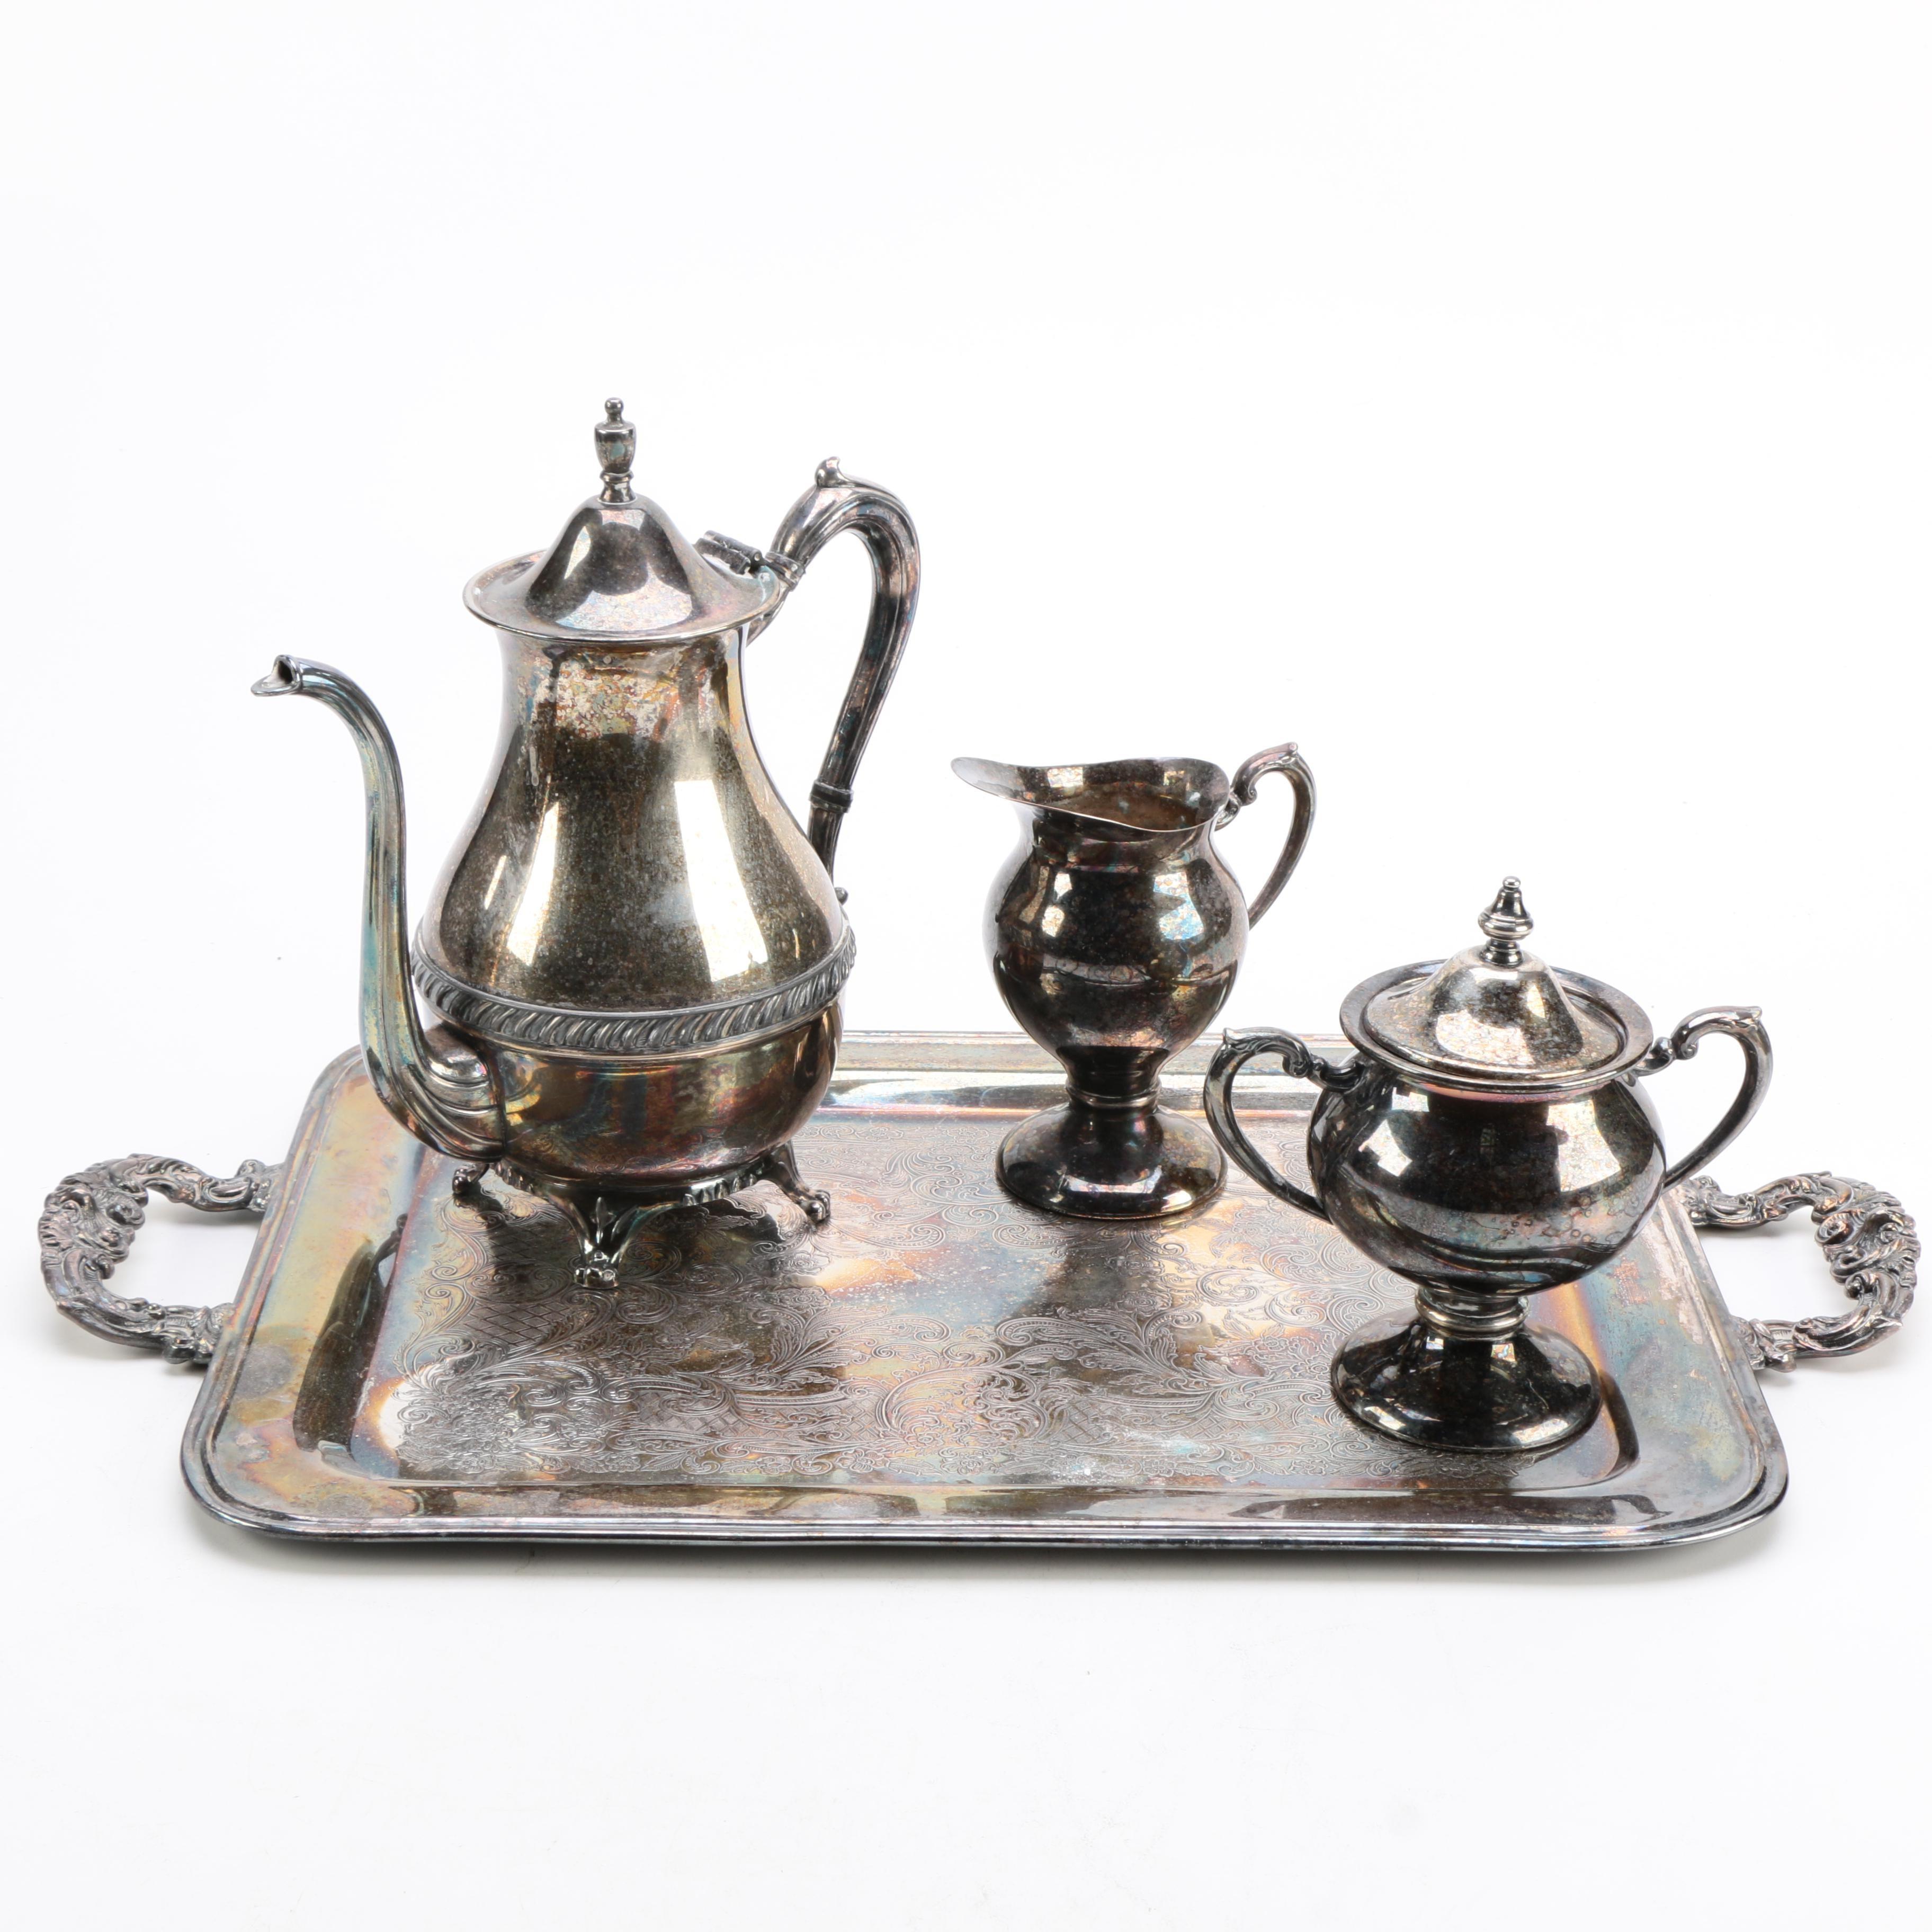 Assembled Silver Plate Tea Service